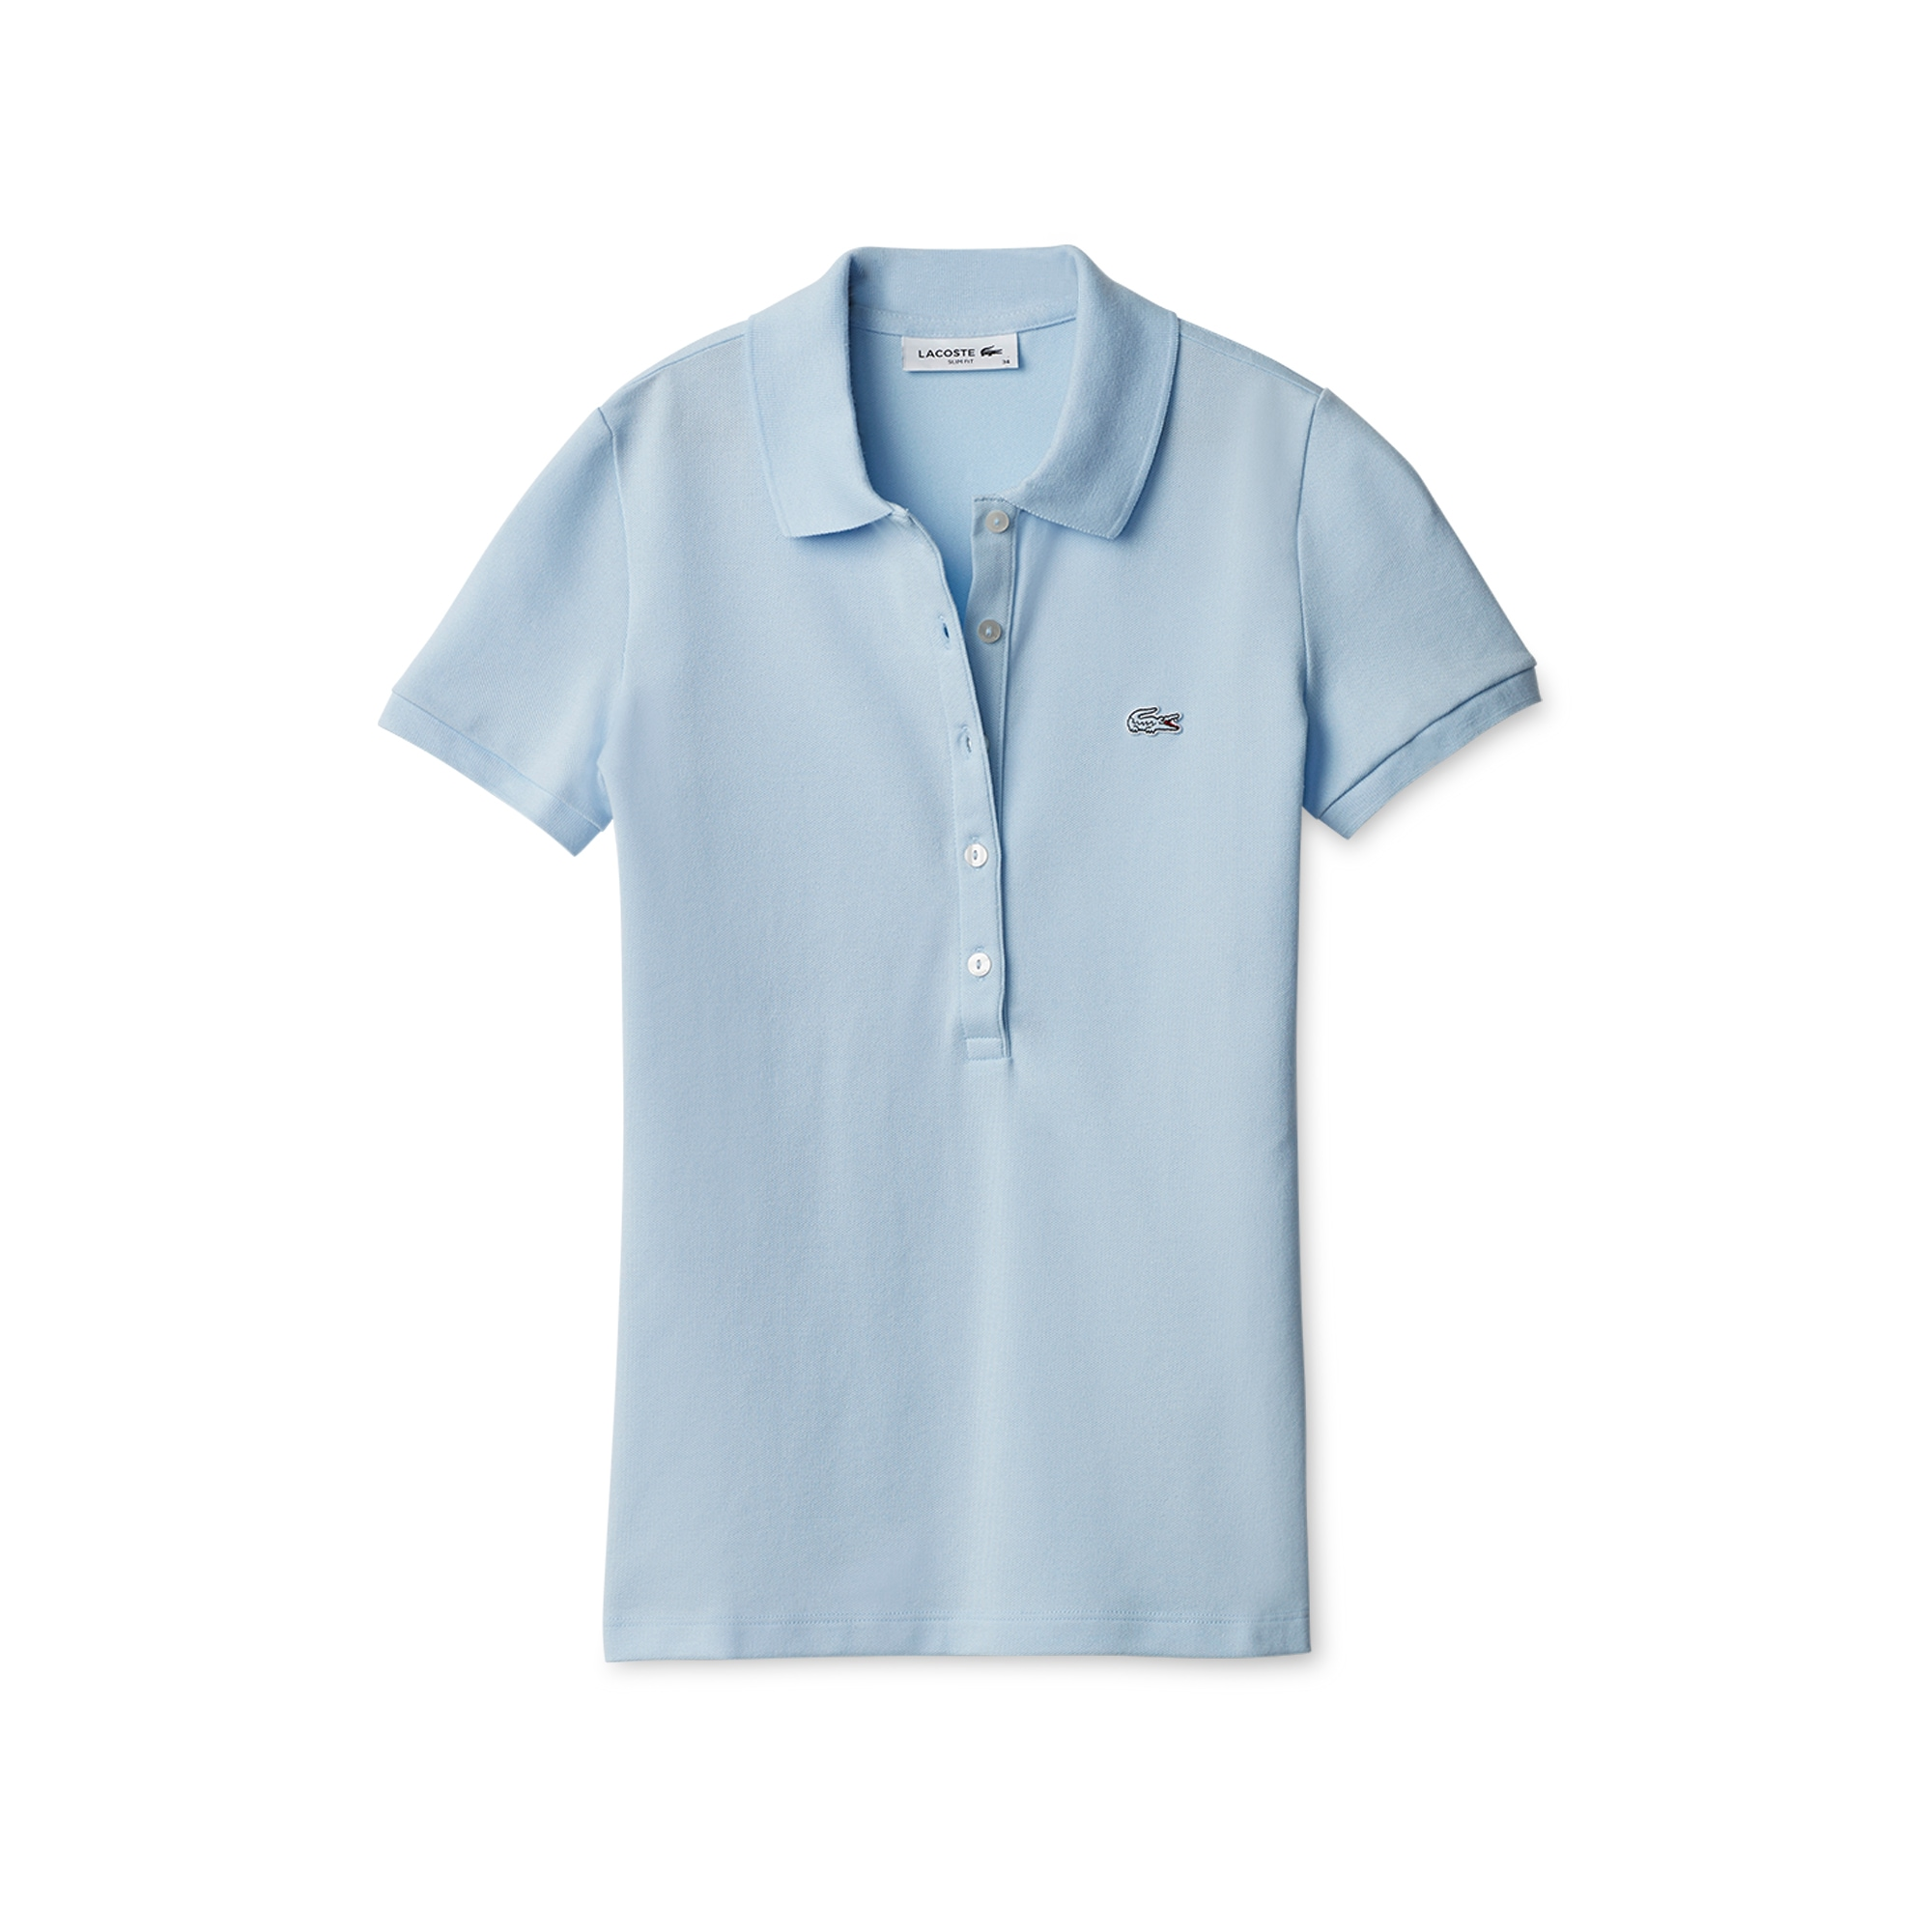 2e9ab1fe7e Camisas polo para mulheres  manga longa e sem manga